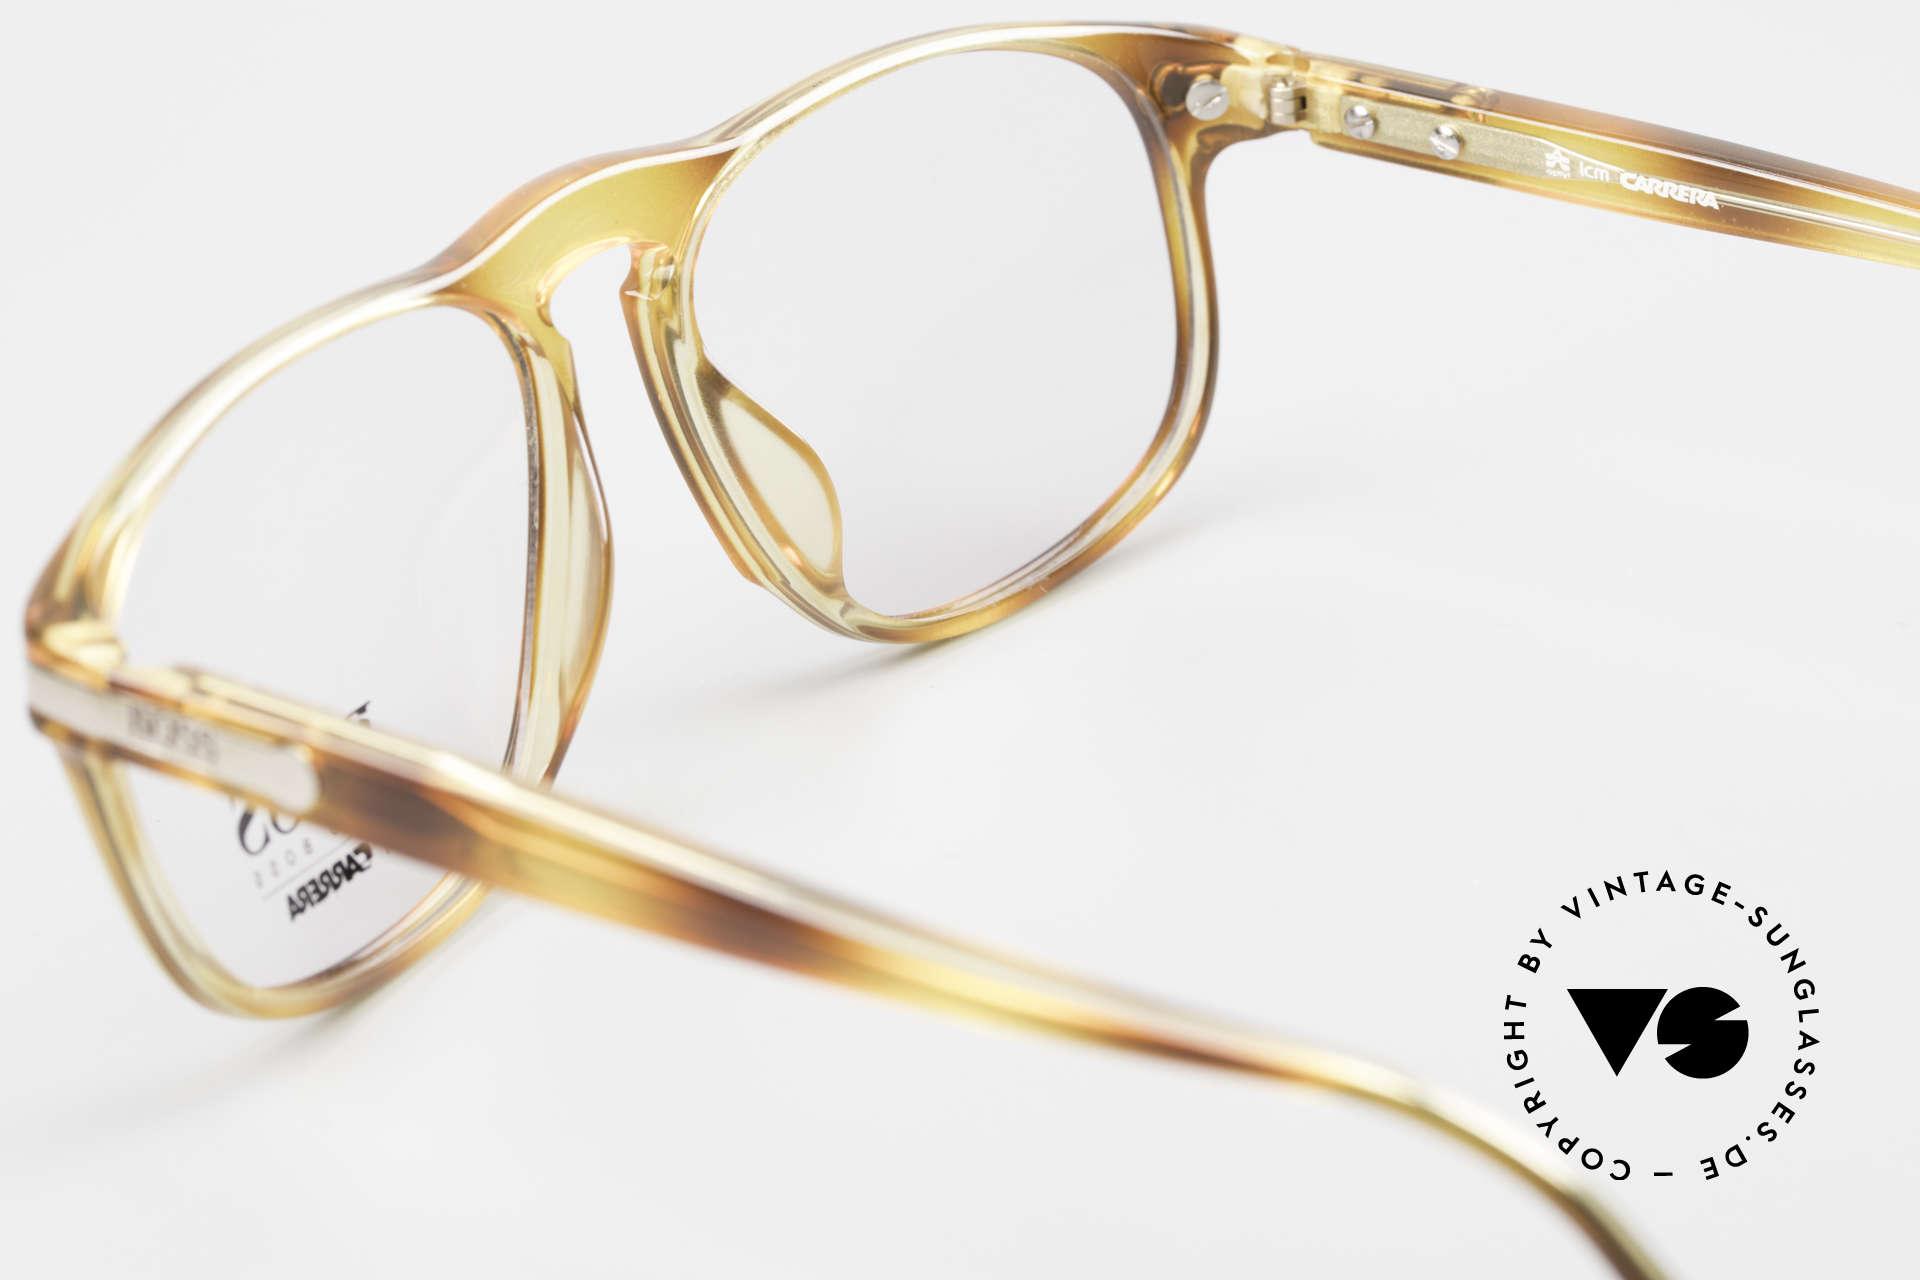 BOSS 5102 Square Vintage Optyl Glasses, new old stock (unworn) - NO RETRO SUNGLASSES!, Made for Men